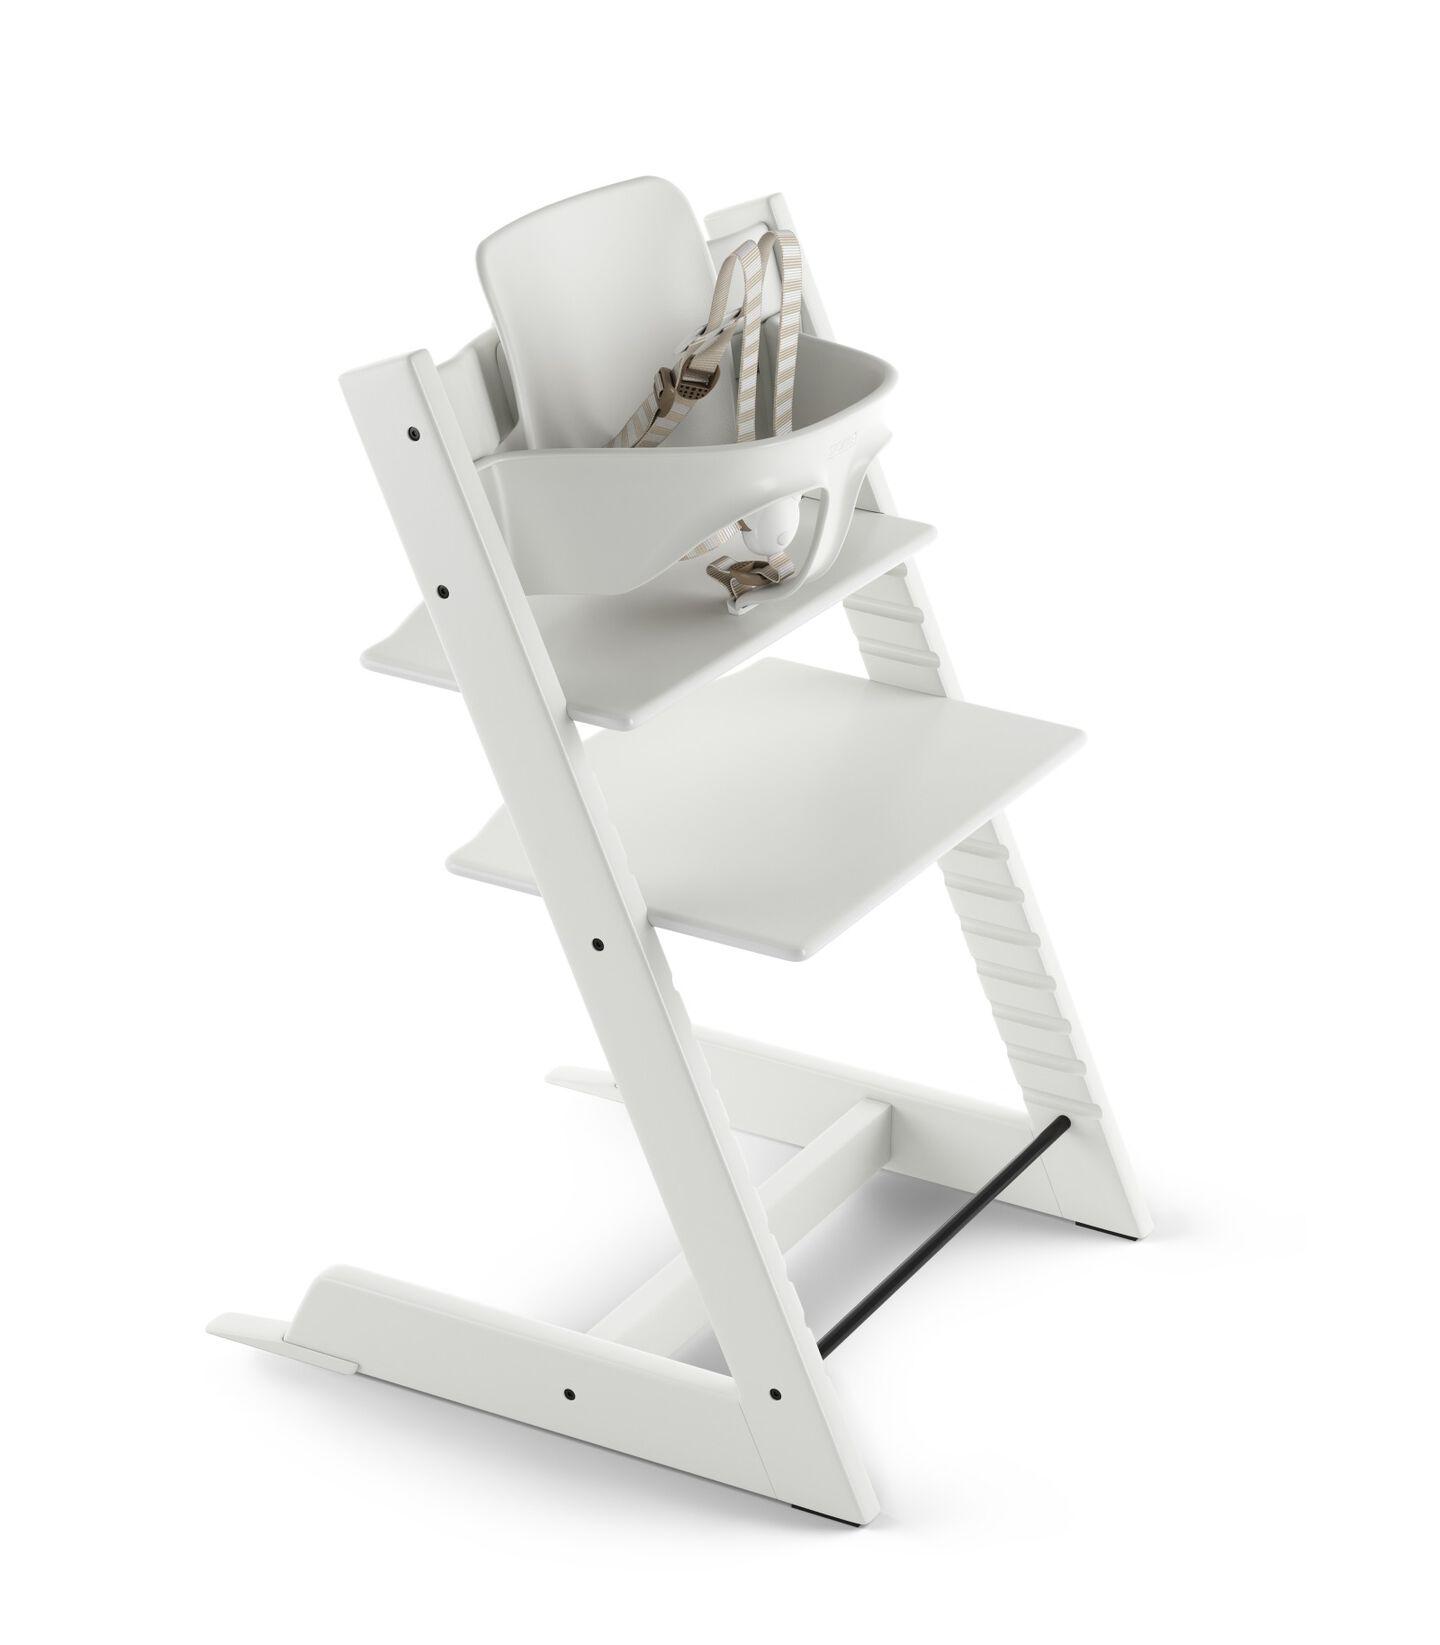 tripp trapp baby set white. Black Bedroom Furniture Sets. Home Design Ideas